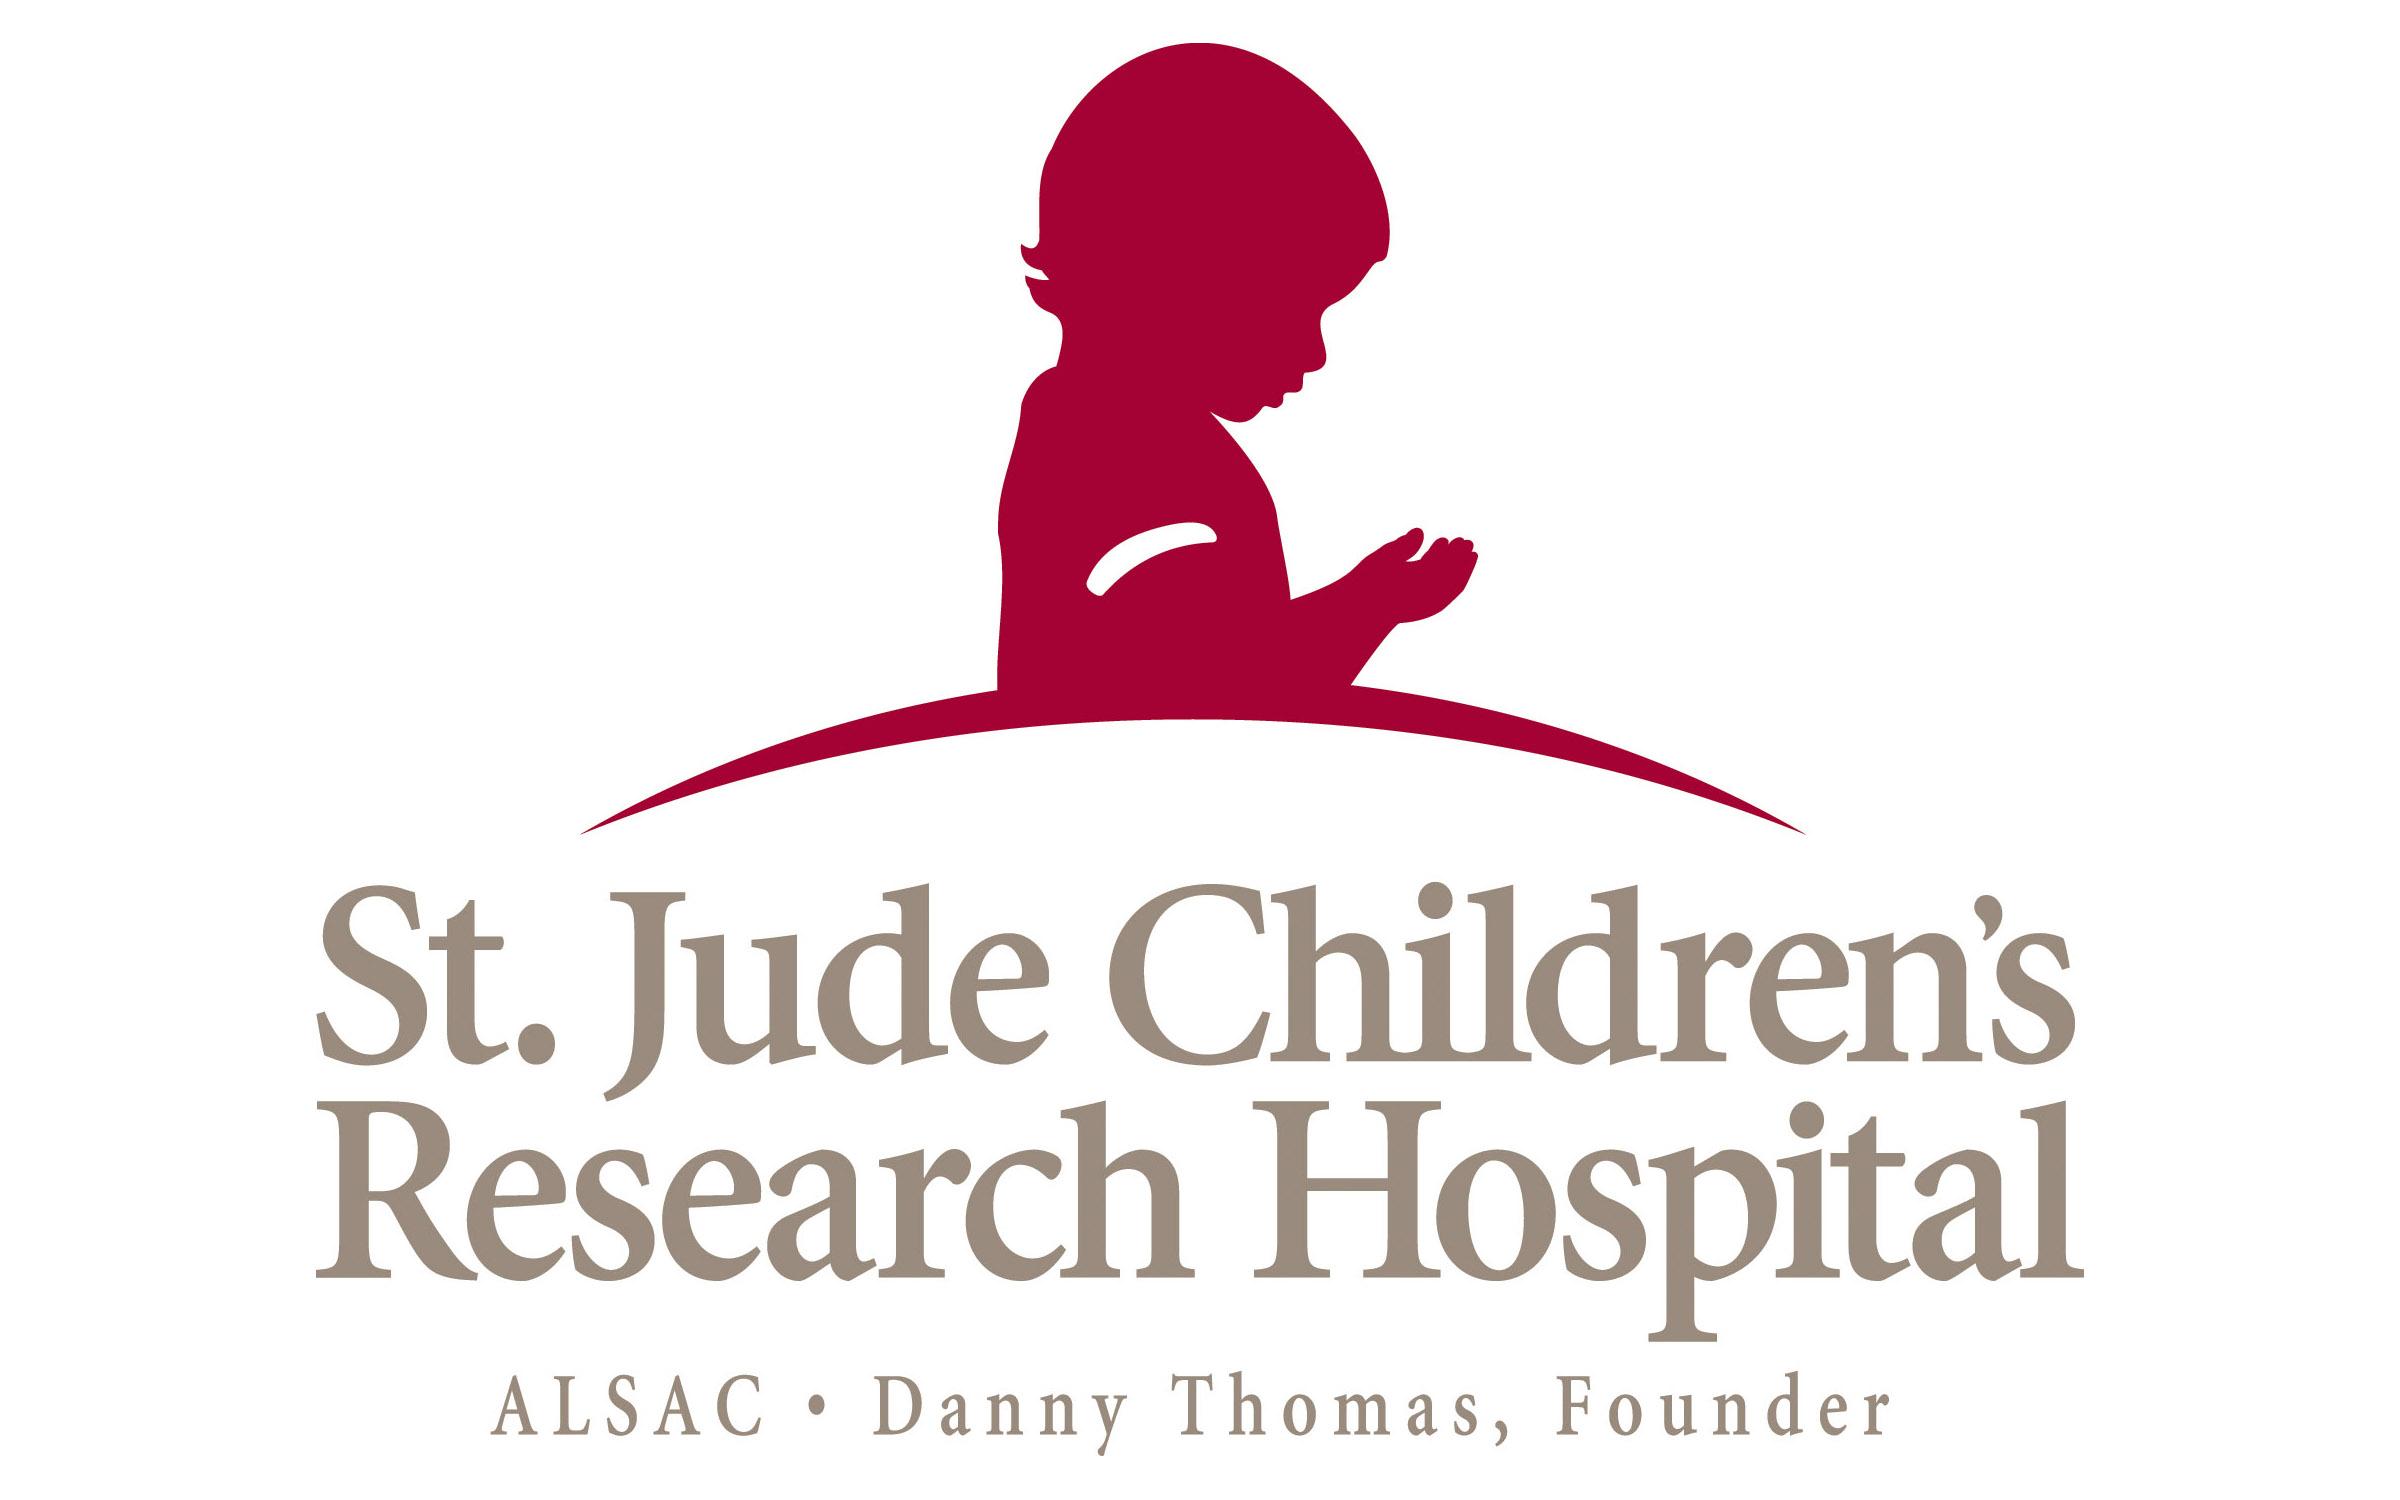 st.-jude-childrens-research-hospital.jpg